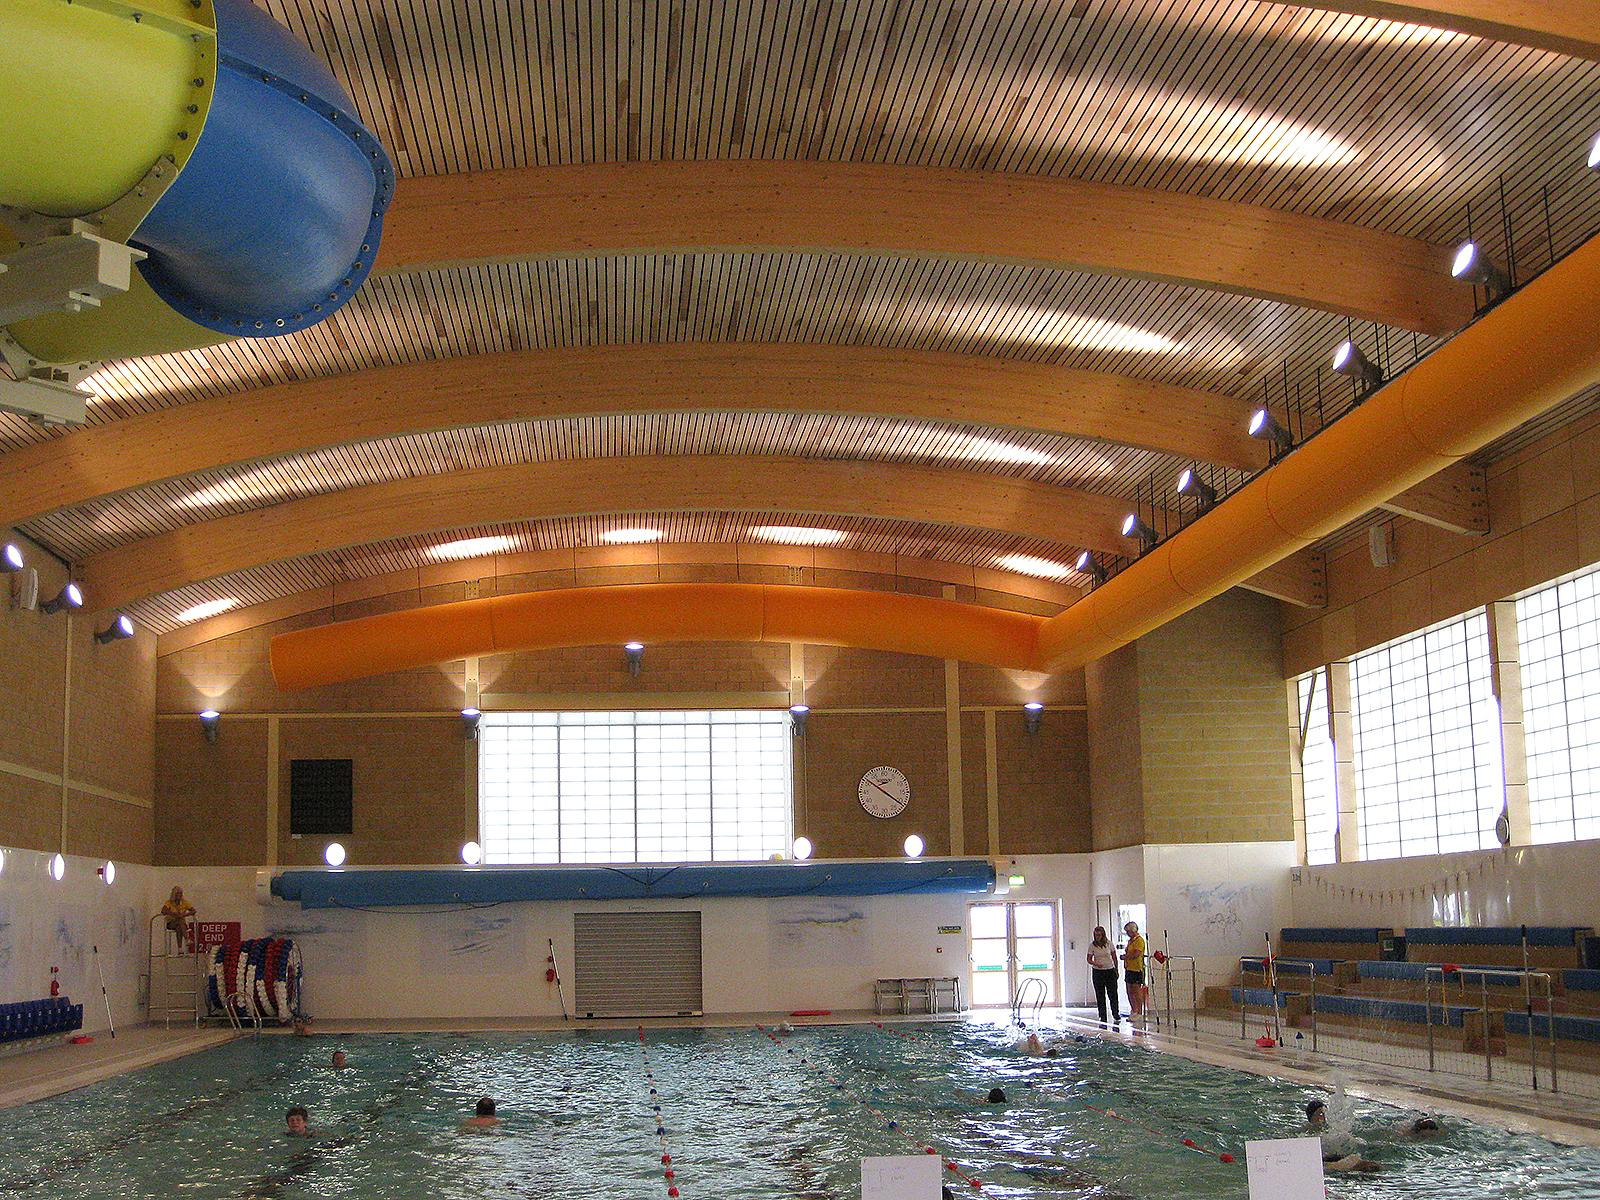 Fraserburgh Swimming Pool | Design, Supply and Erection of ... | 1600 x 1200 jpeg 3194kB